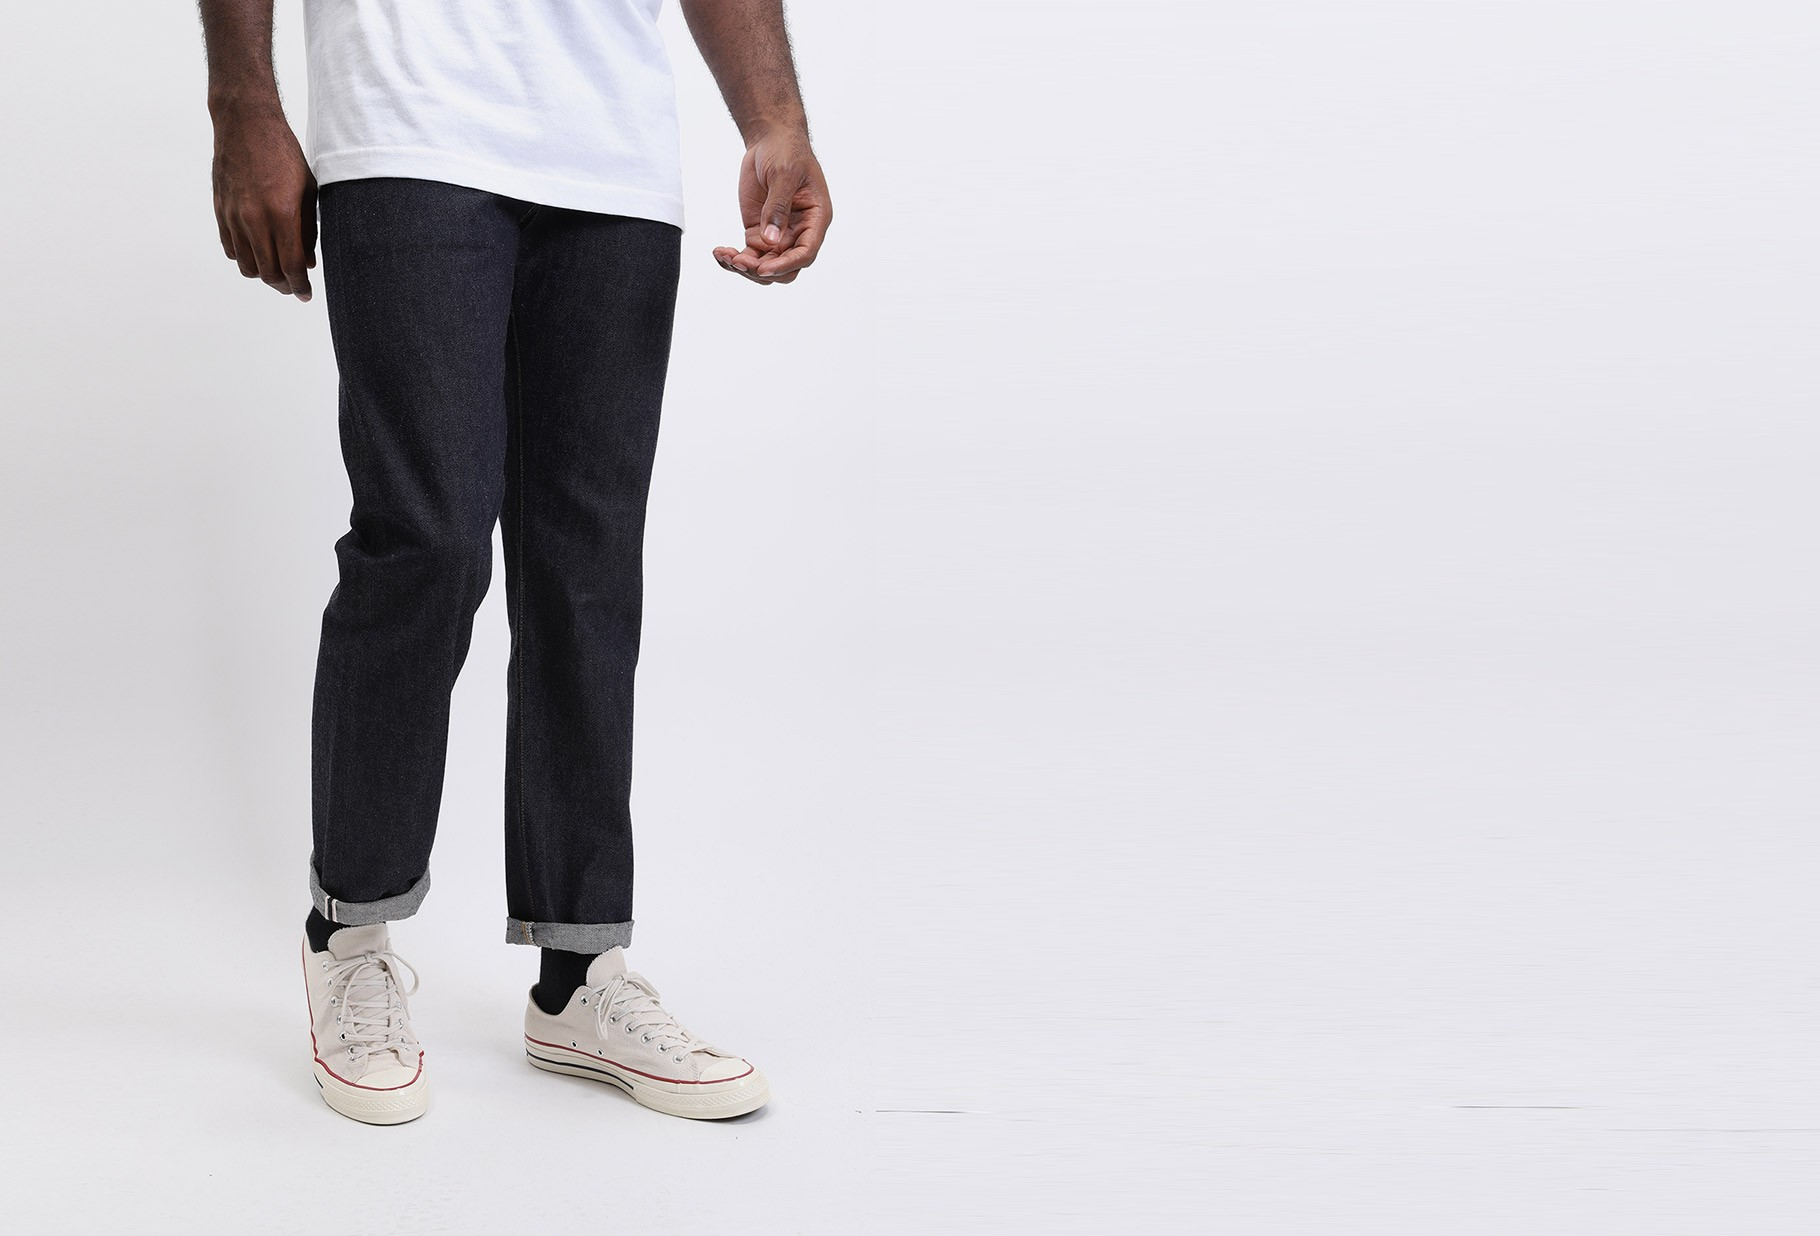 LEVI'S ® VINTAGE CLOTHING / 1954 501™ jeans rigid C7835 v2